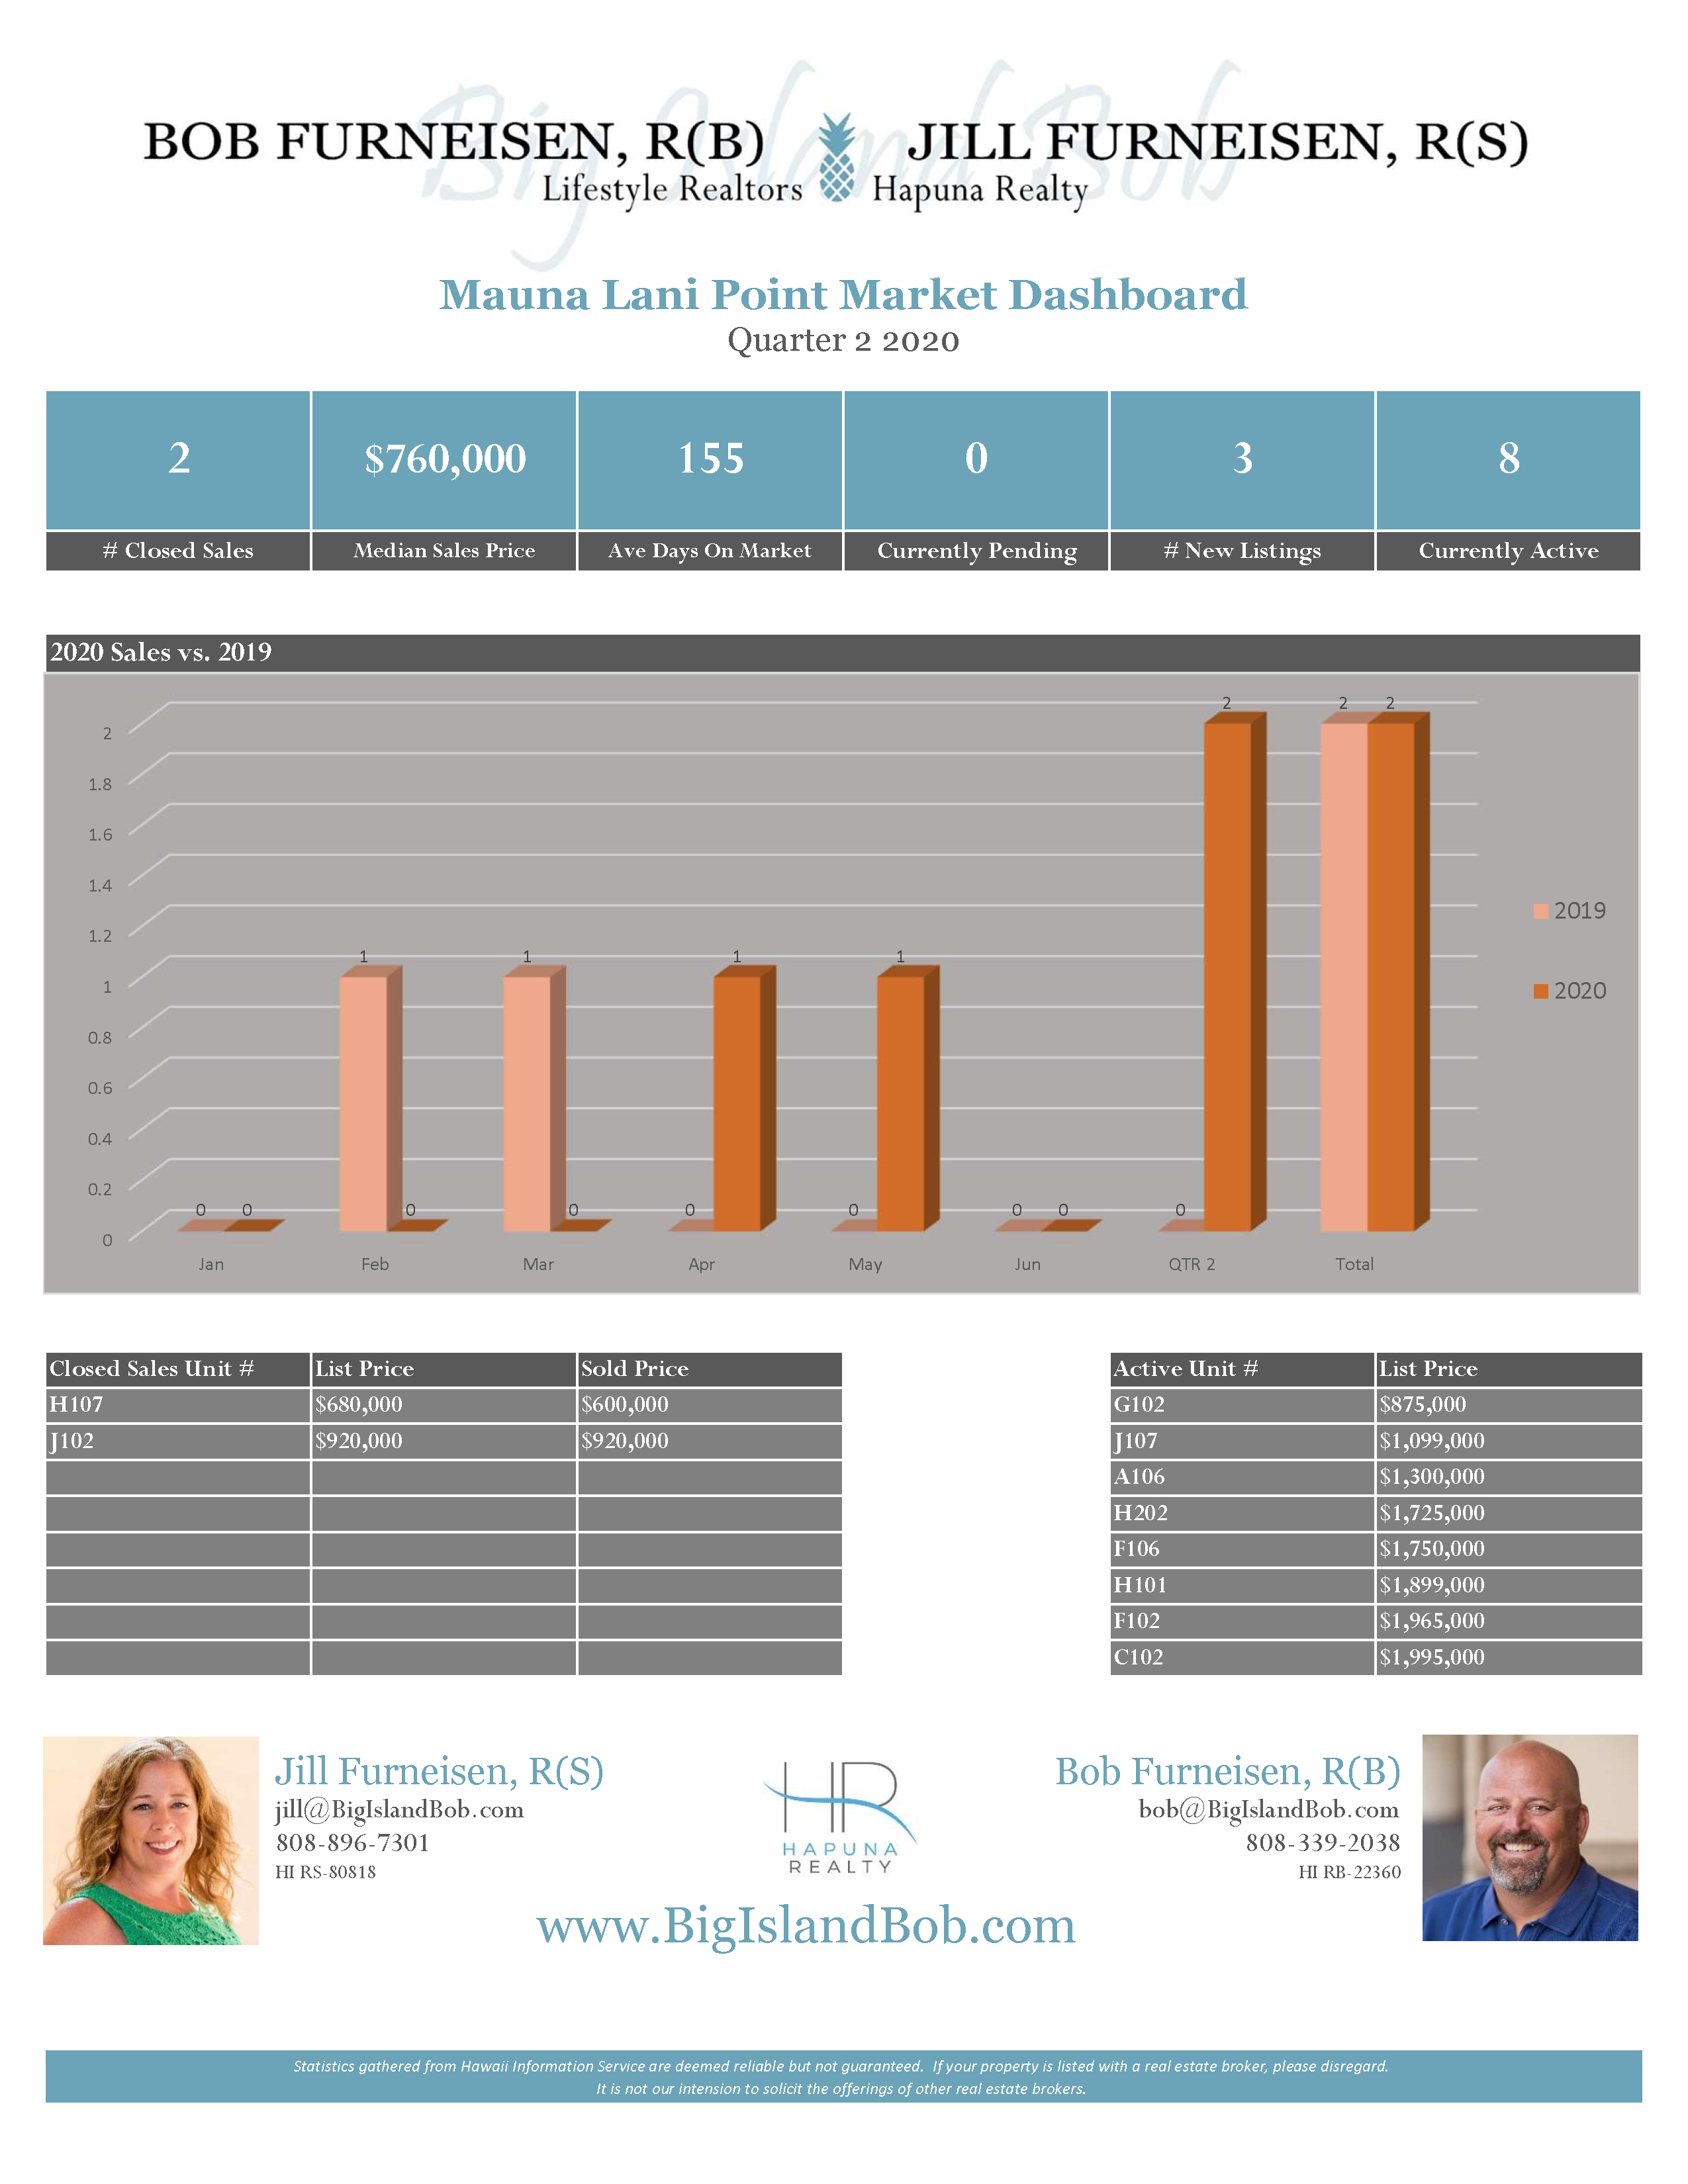 Mauna Lani Point Quarter 2 2020 Real Estate Market Dashboard